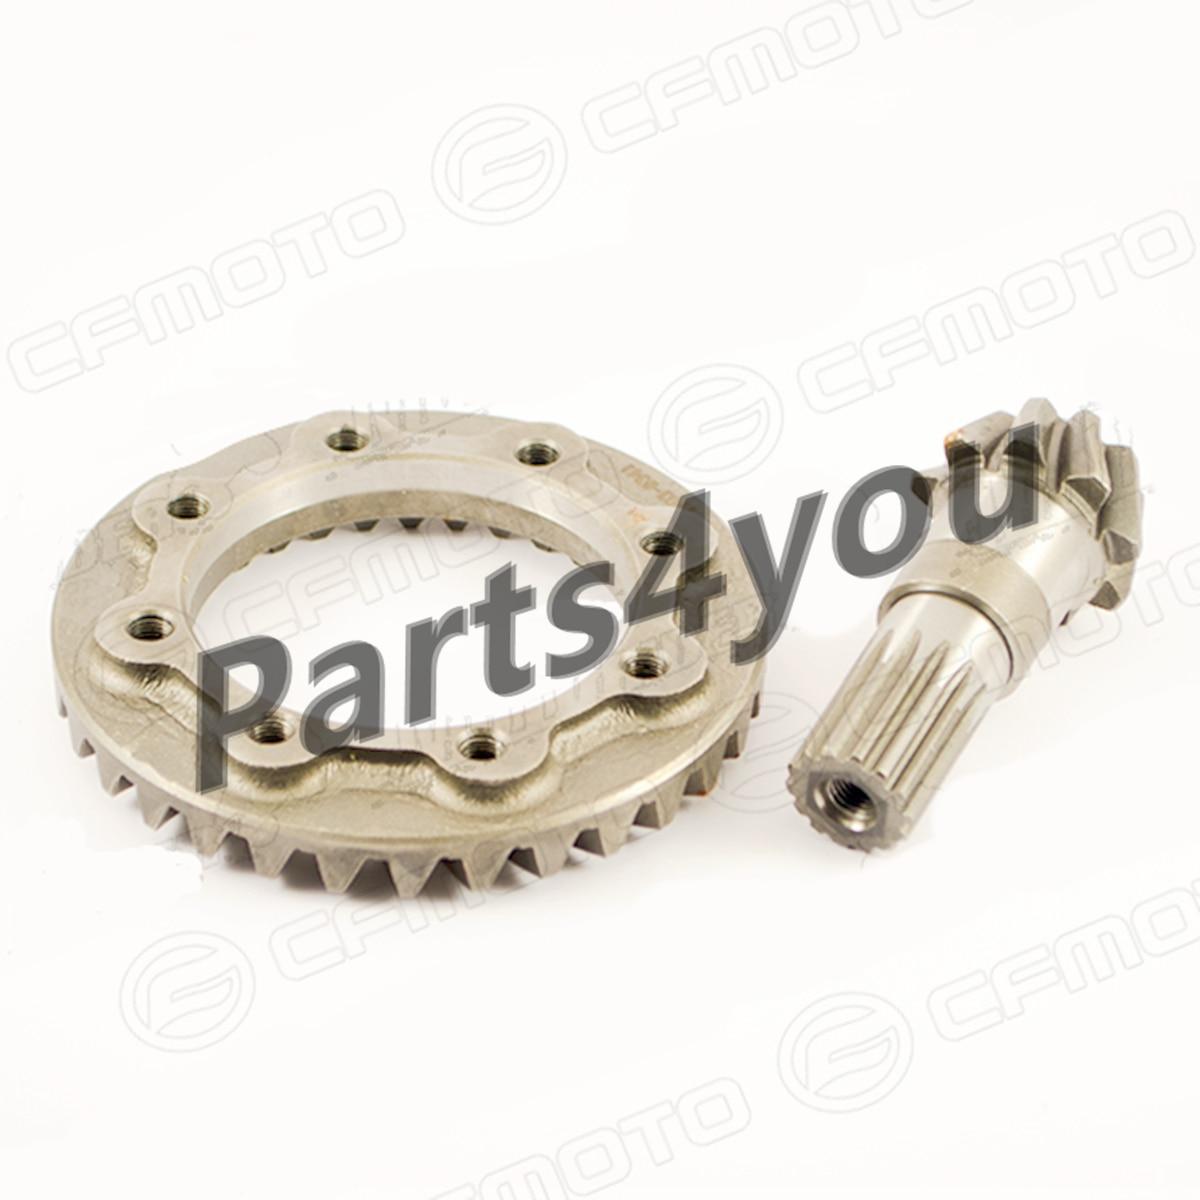 Drive Pinion Gear Differential Gear for CFmoto ATV UTV CF1000 CForce 1000 CF400 450 CF500 520 Cforce  CF800 850 Q830-3100A0 enlarge